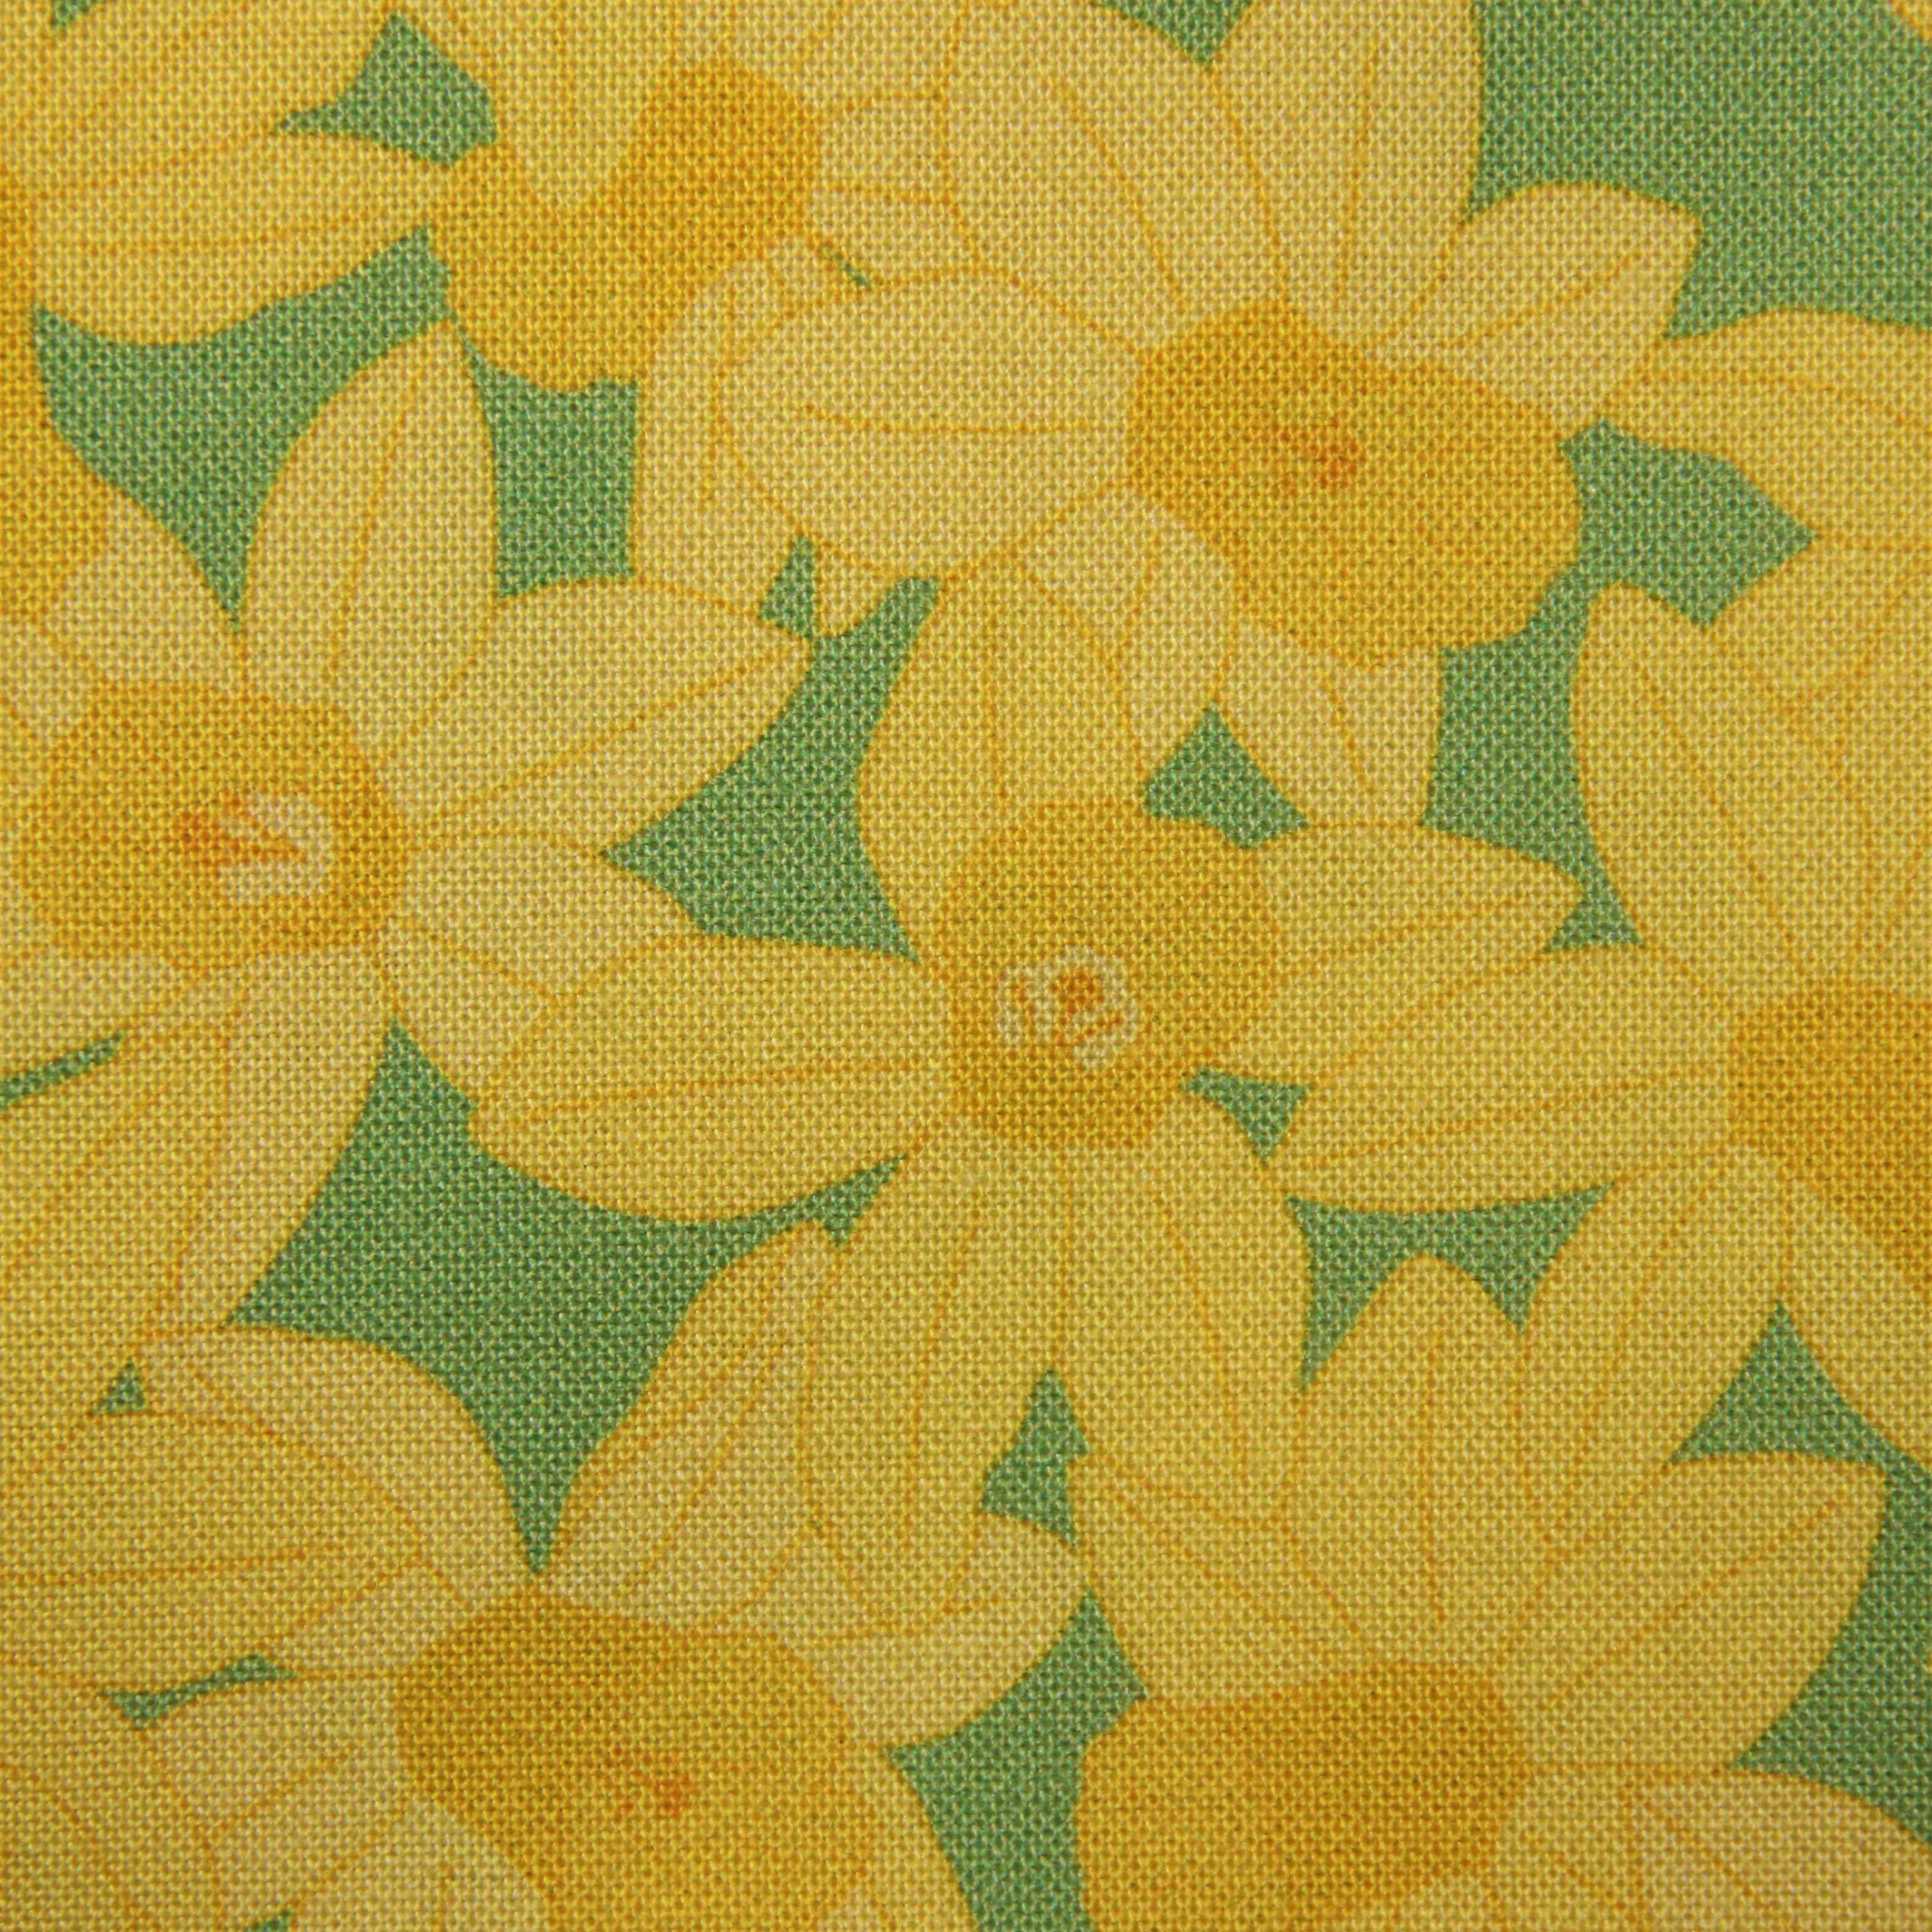 Daffodil fabric fat quarter